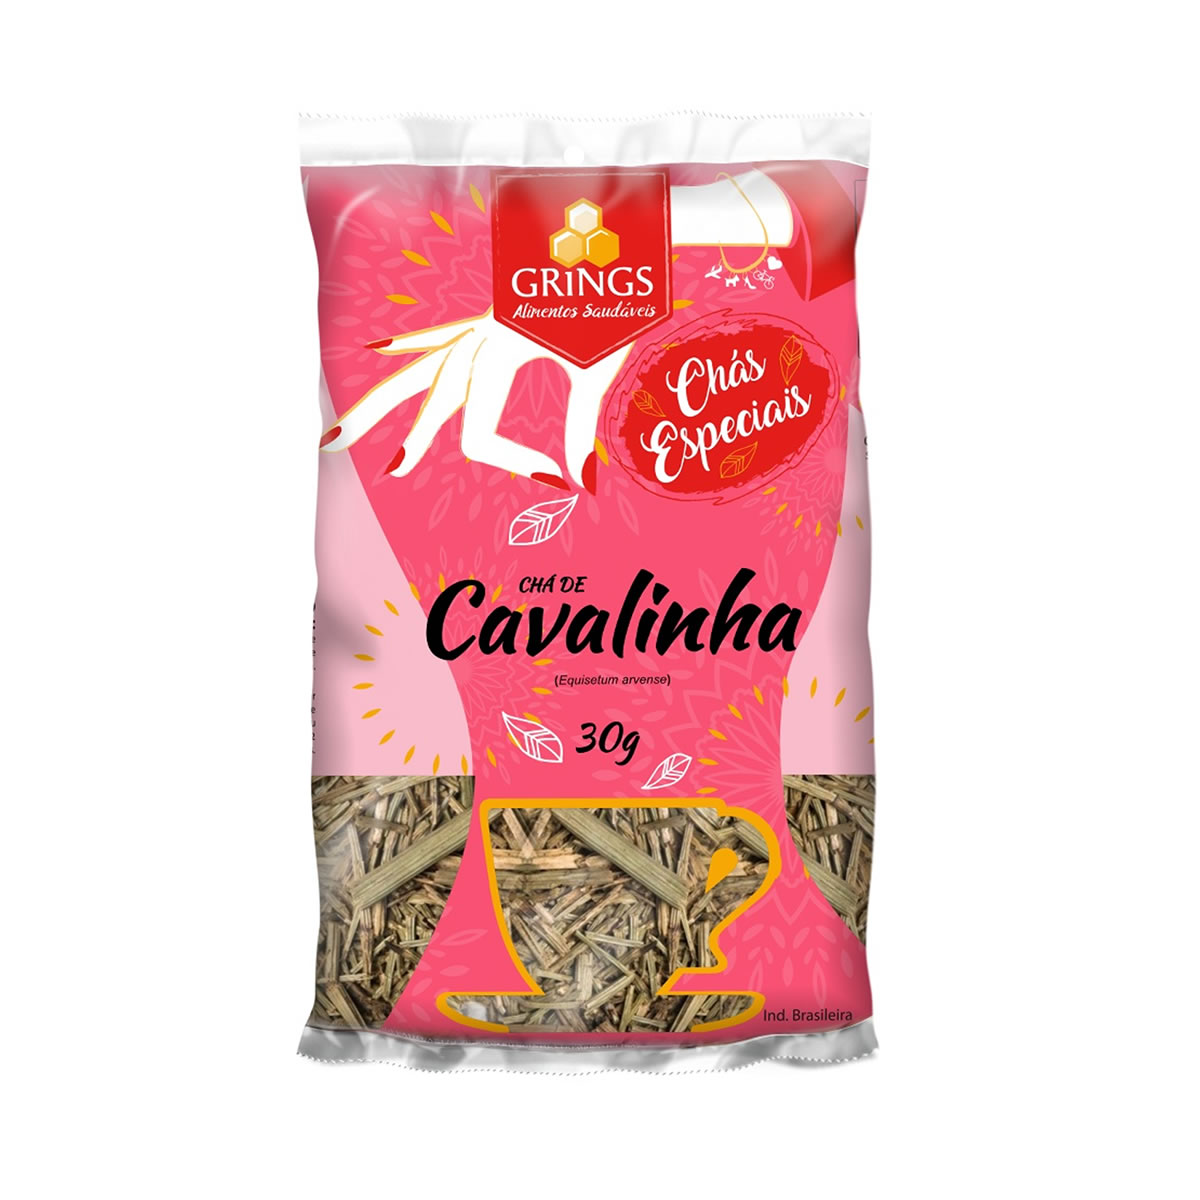 Chá Cavalinha 30g - Grings